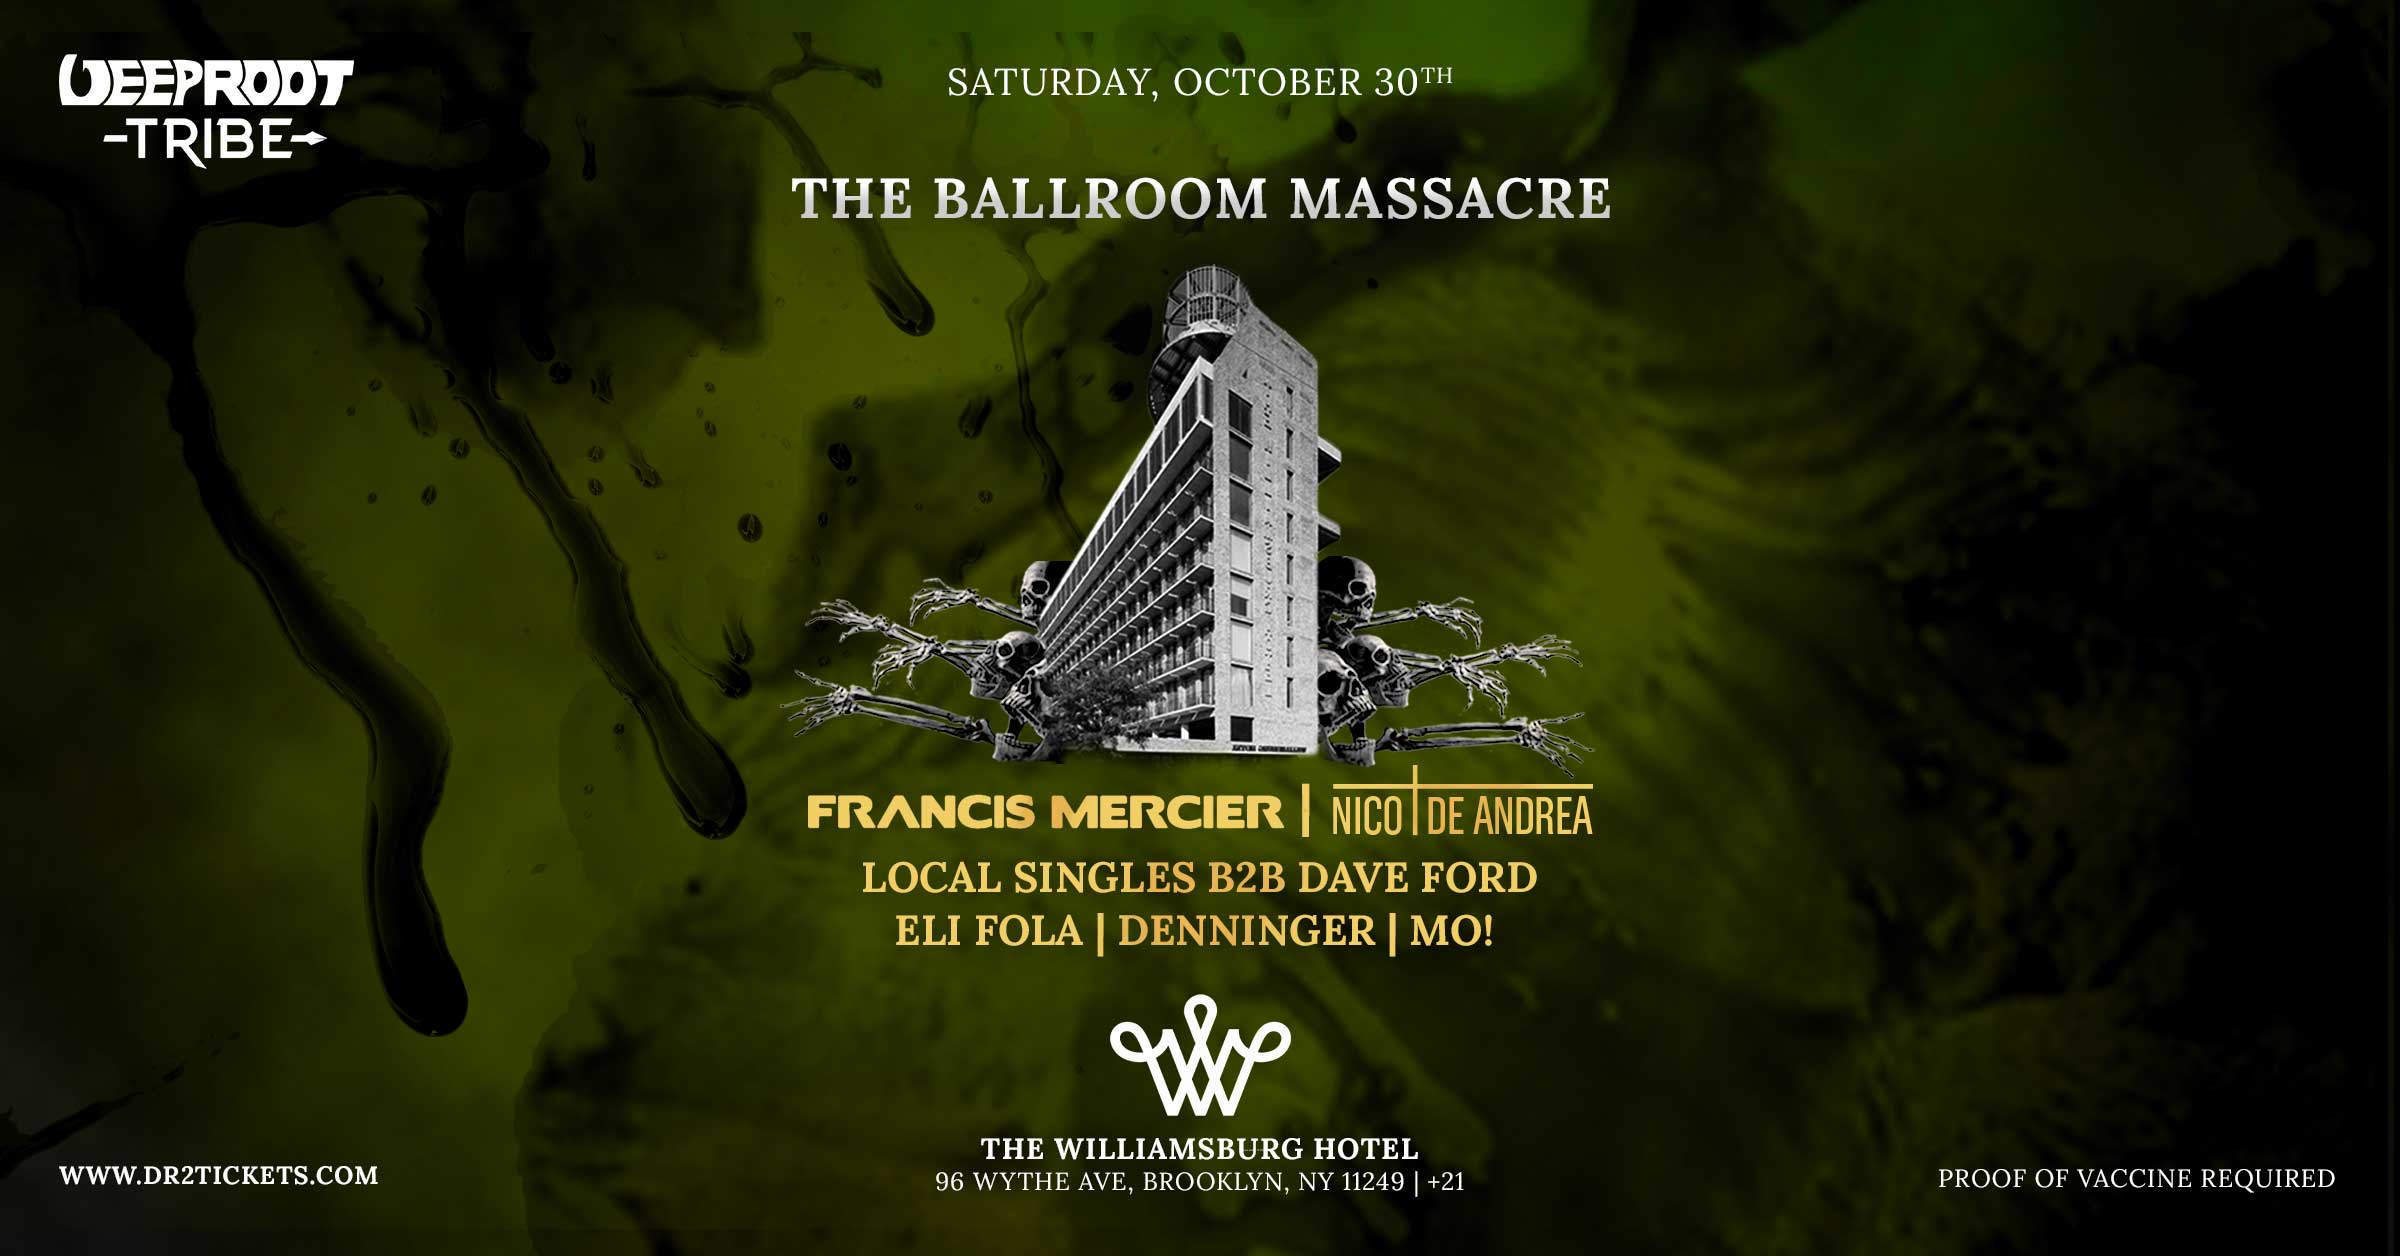 The Ballroom Massacre At The Williamsburg Hotel [10/30]